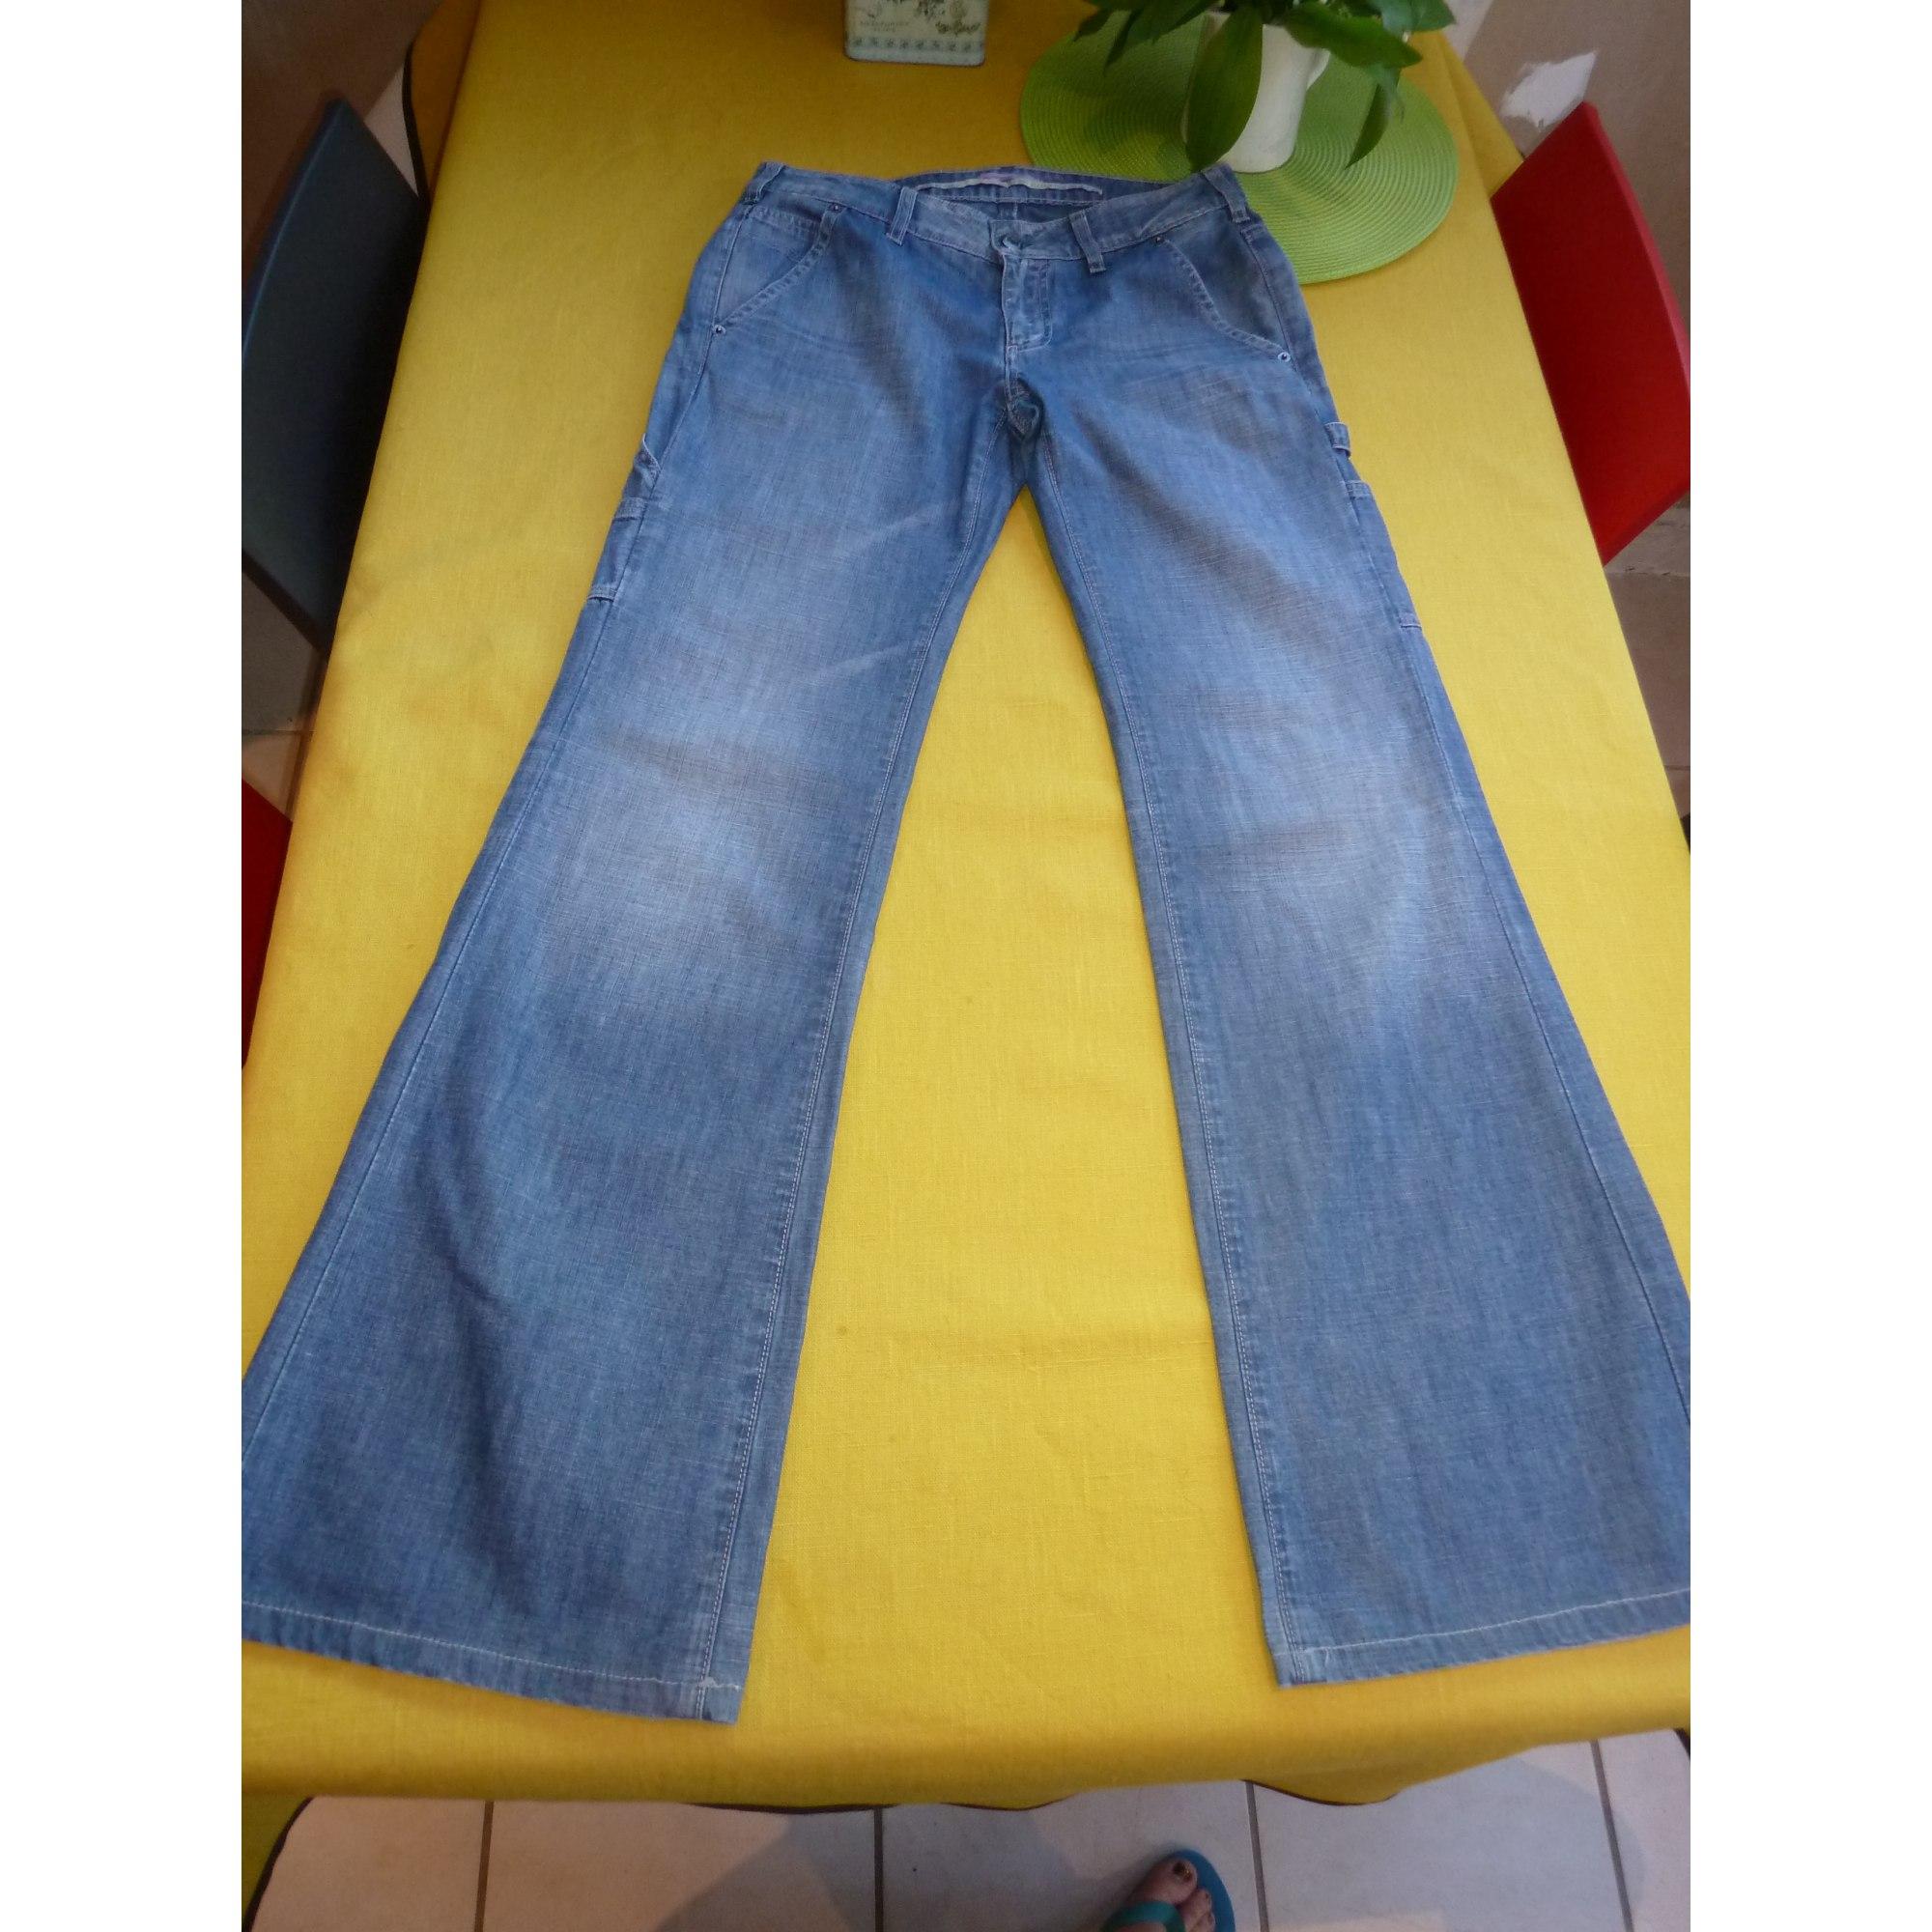 Jeans large, boyfriend VANESSA BRUNO Bleu, bleu marine, bleu turquoise